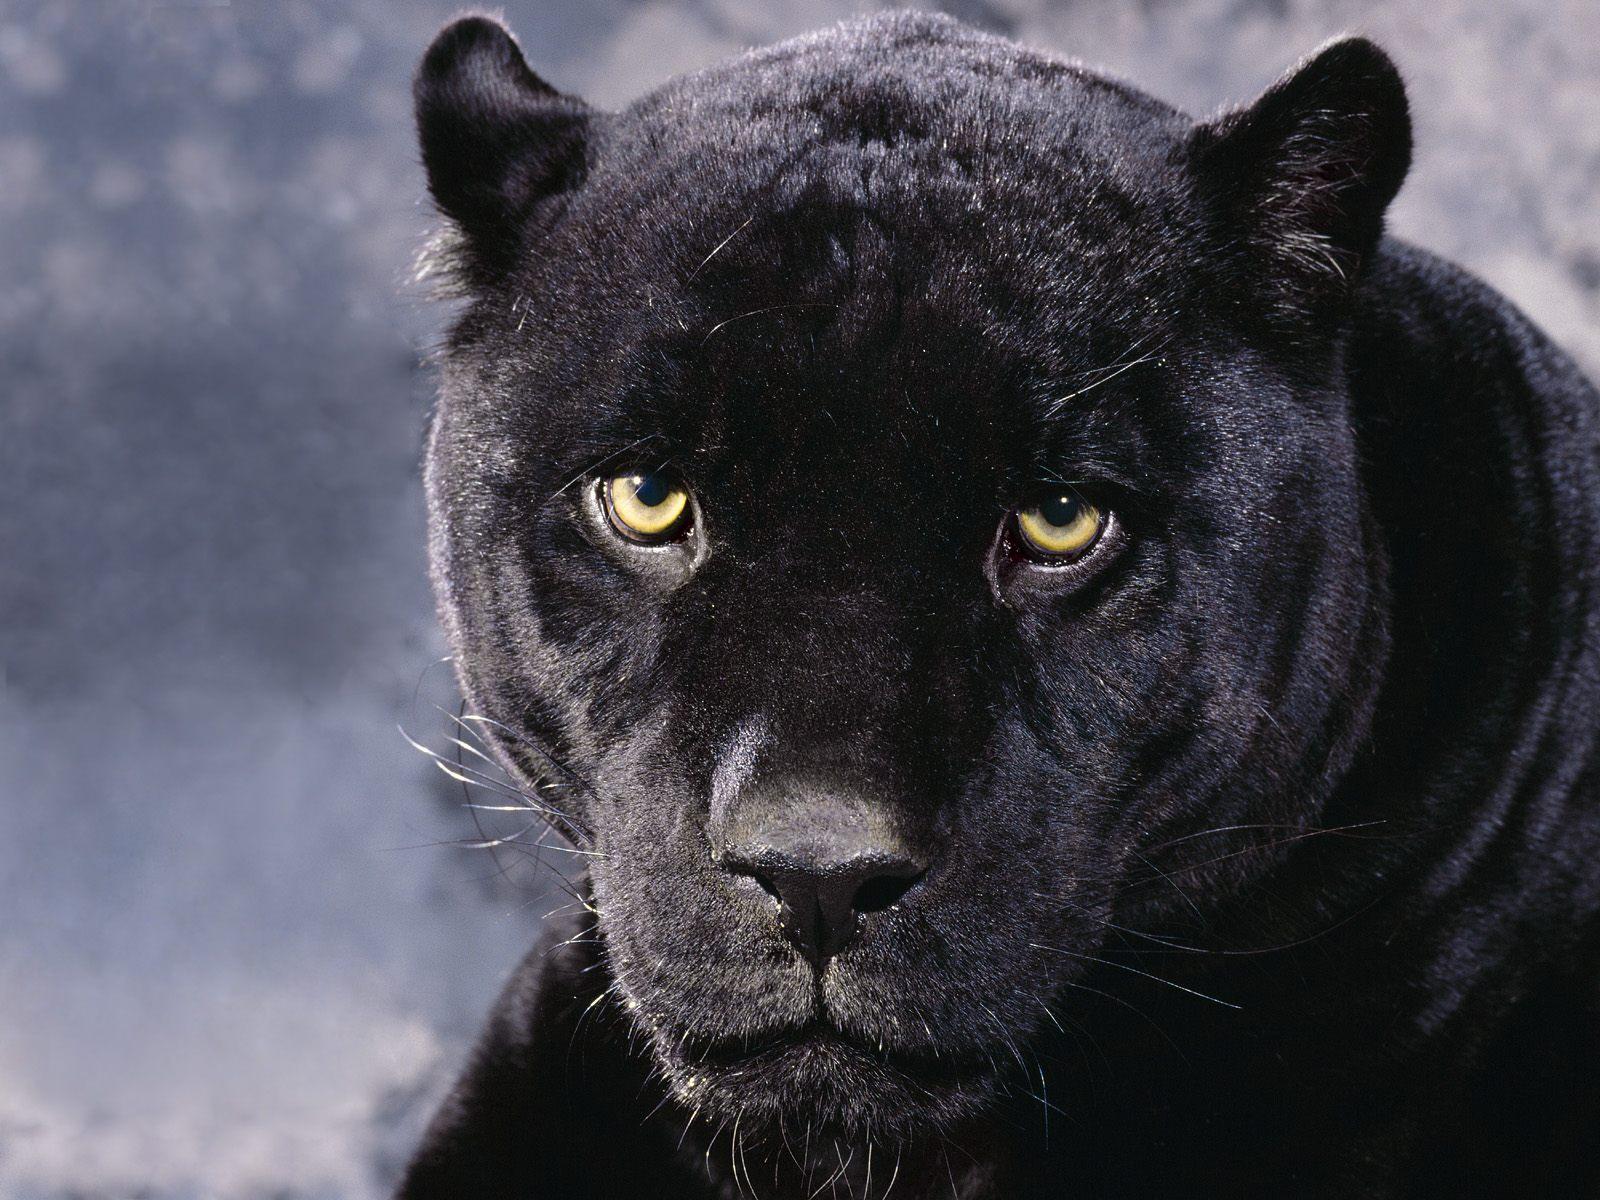 Big black panther Wallpaper   HD Wallpapers 1600x1200